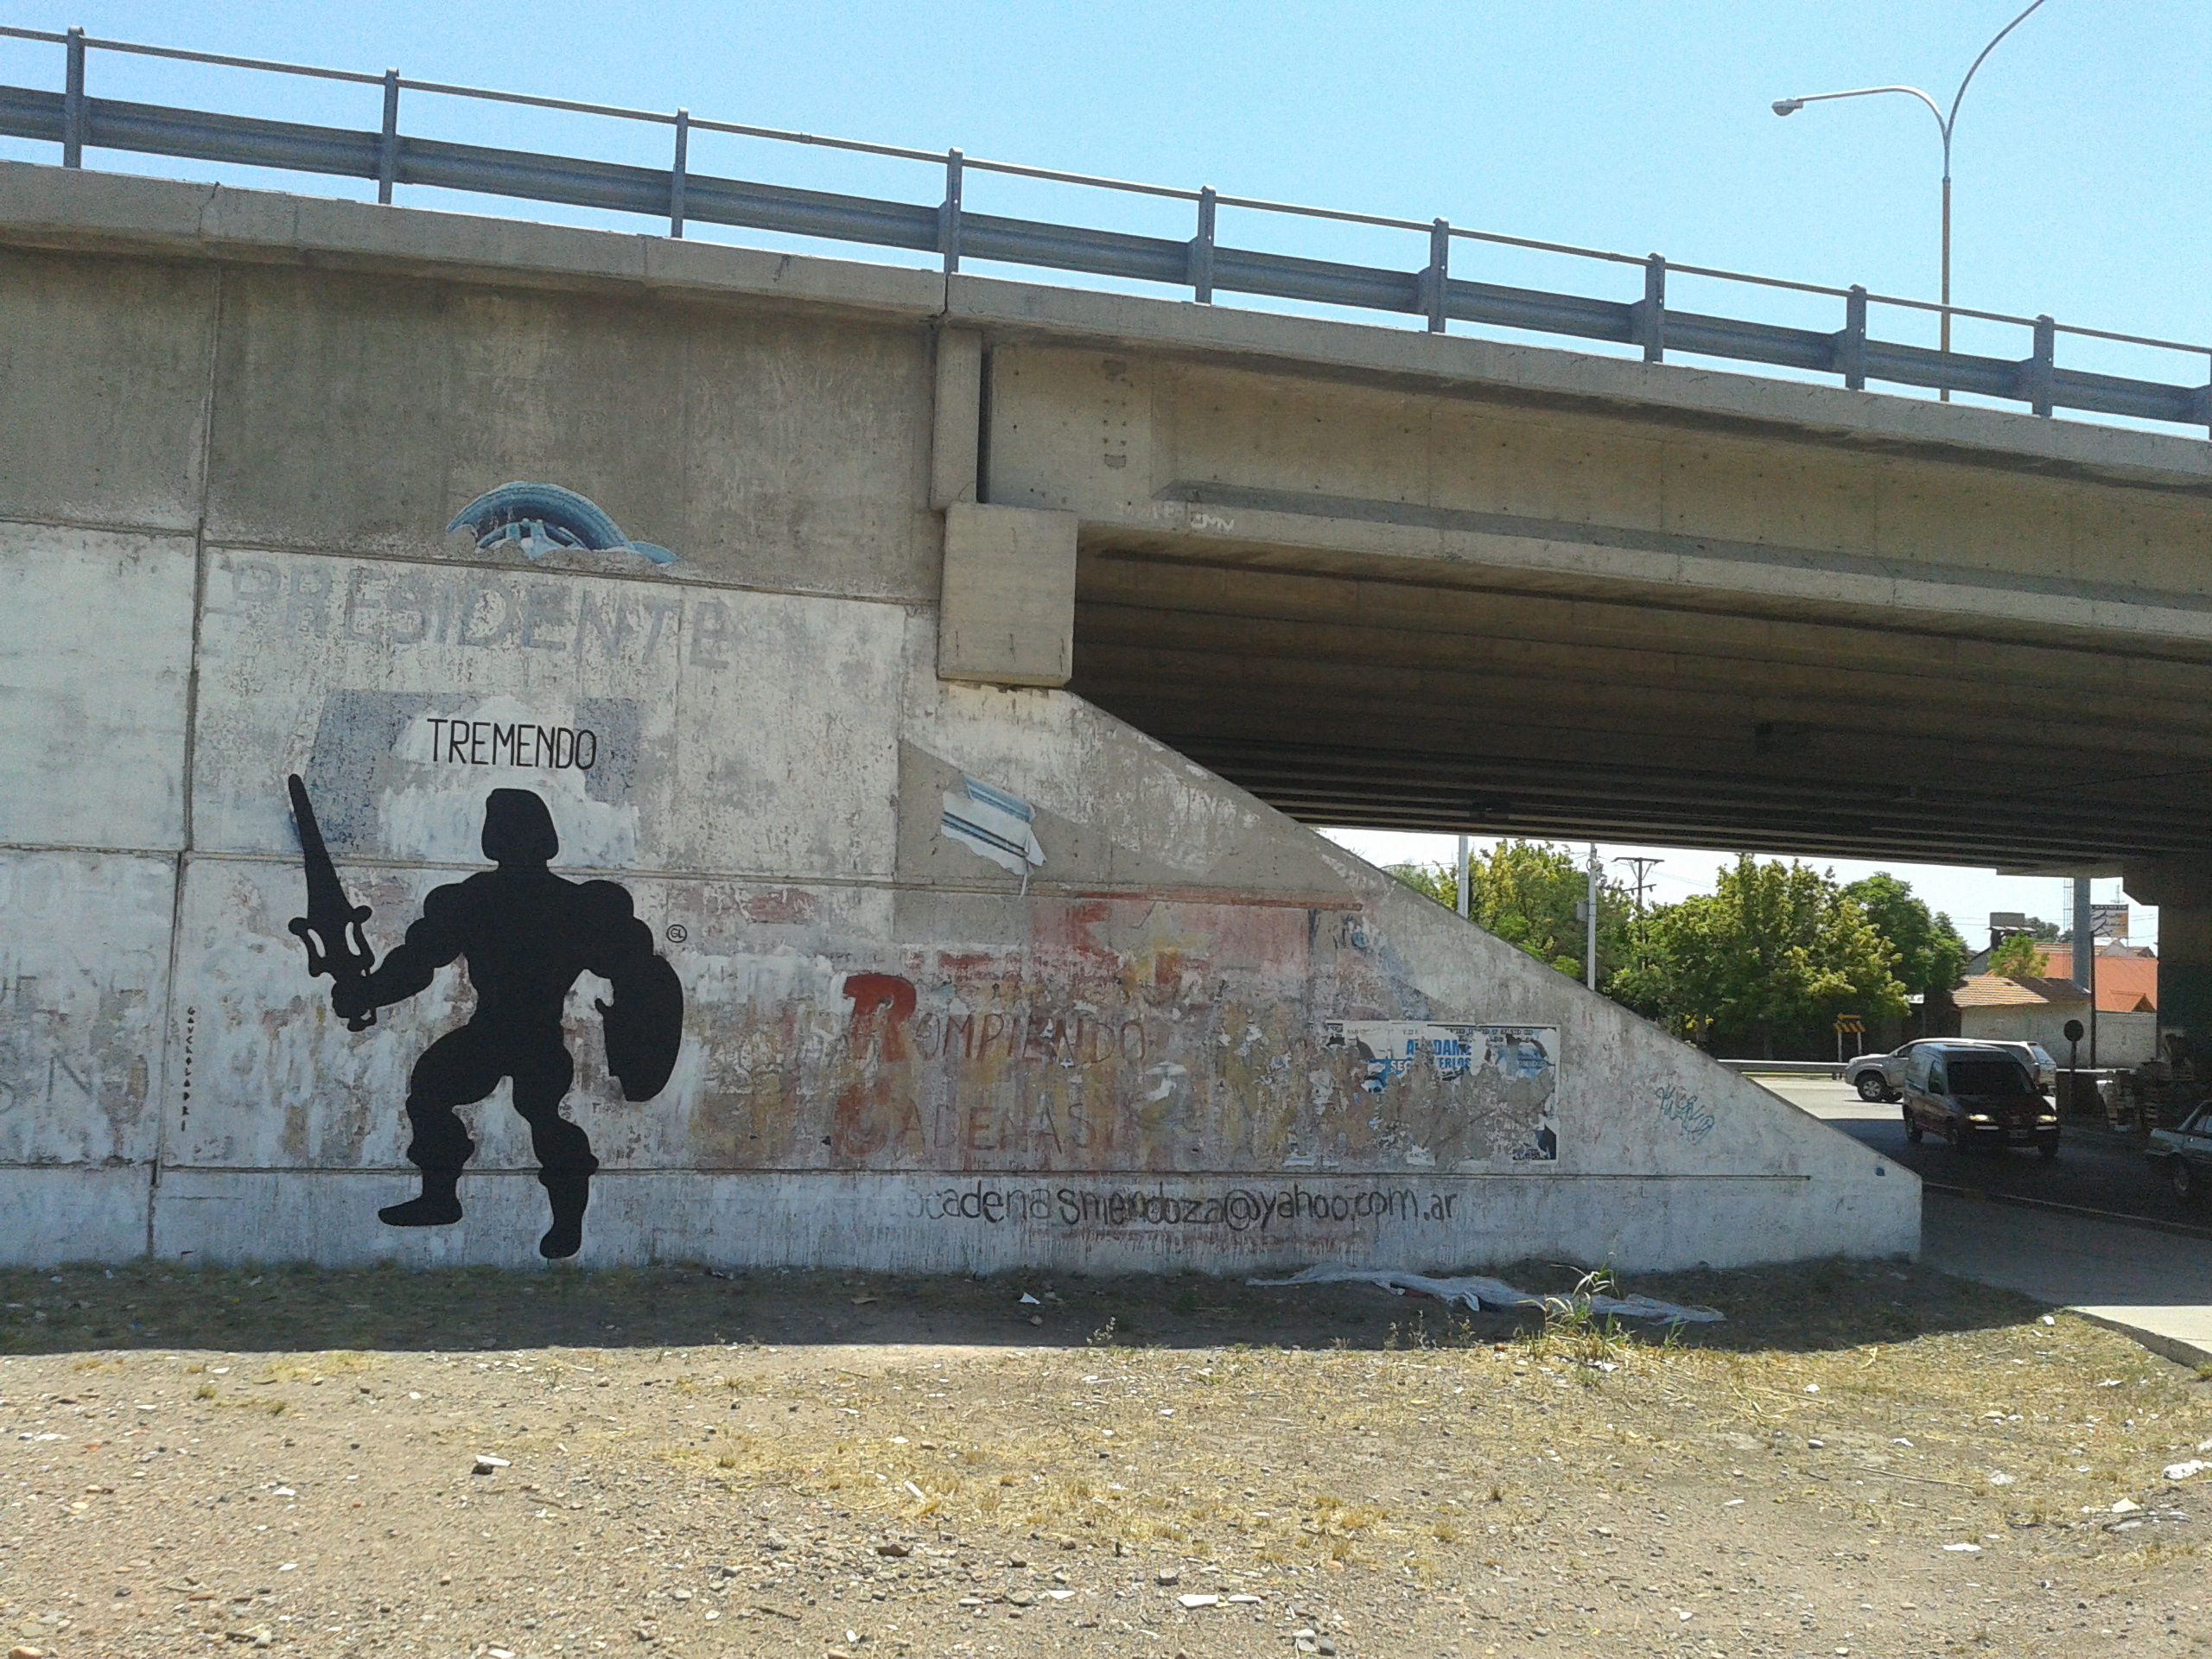 gaucholadri-tremendo-a-new-mural-in-mendoza-argentina-09